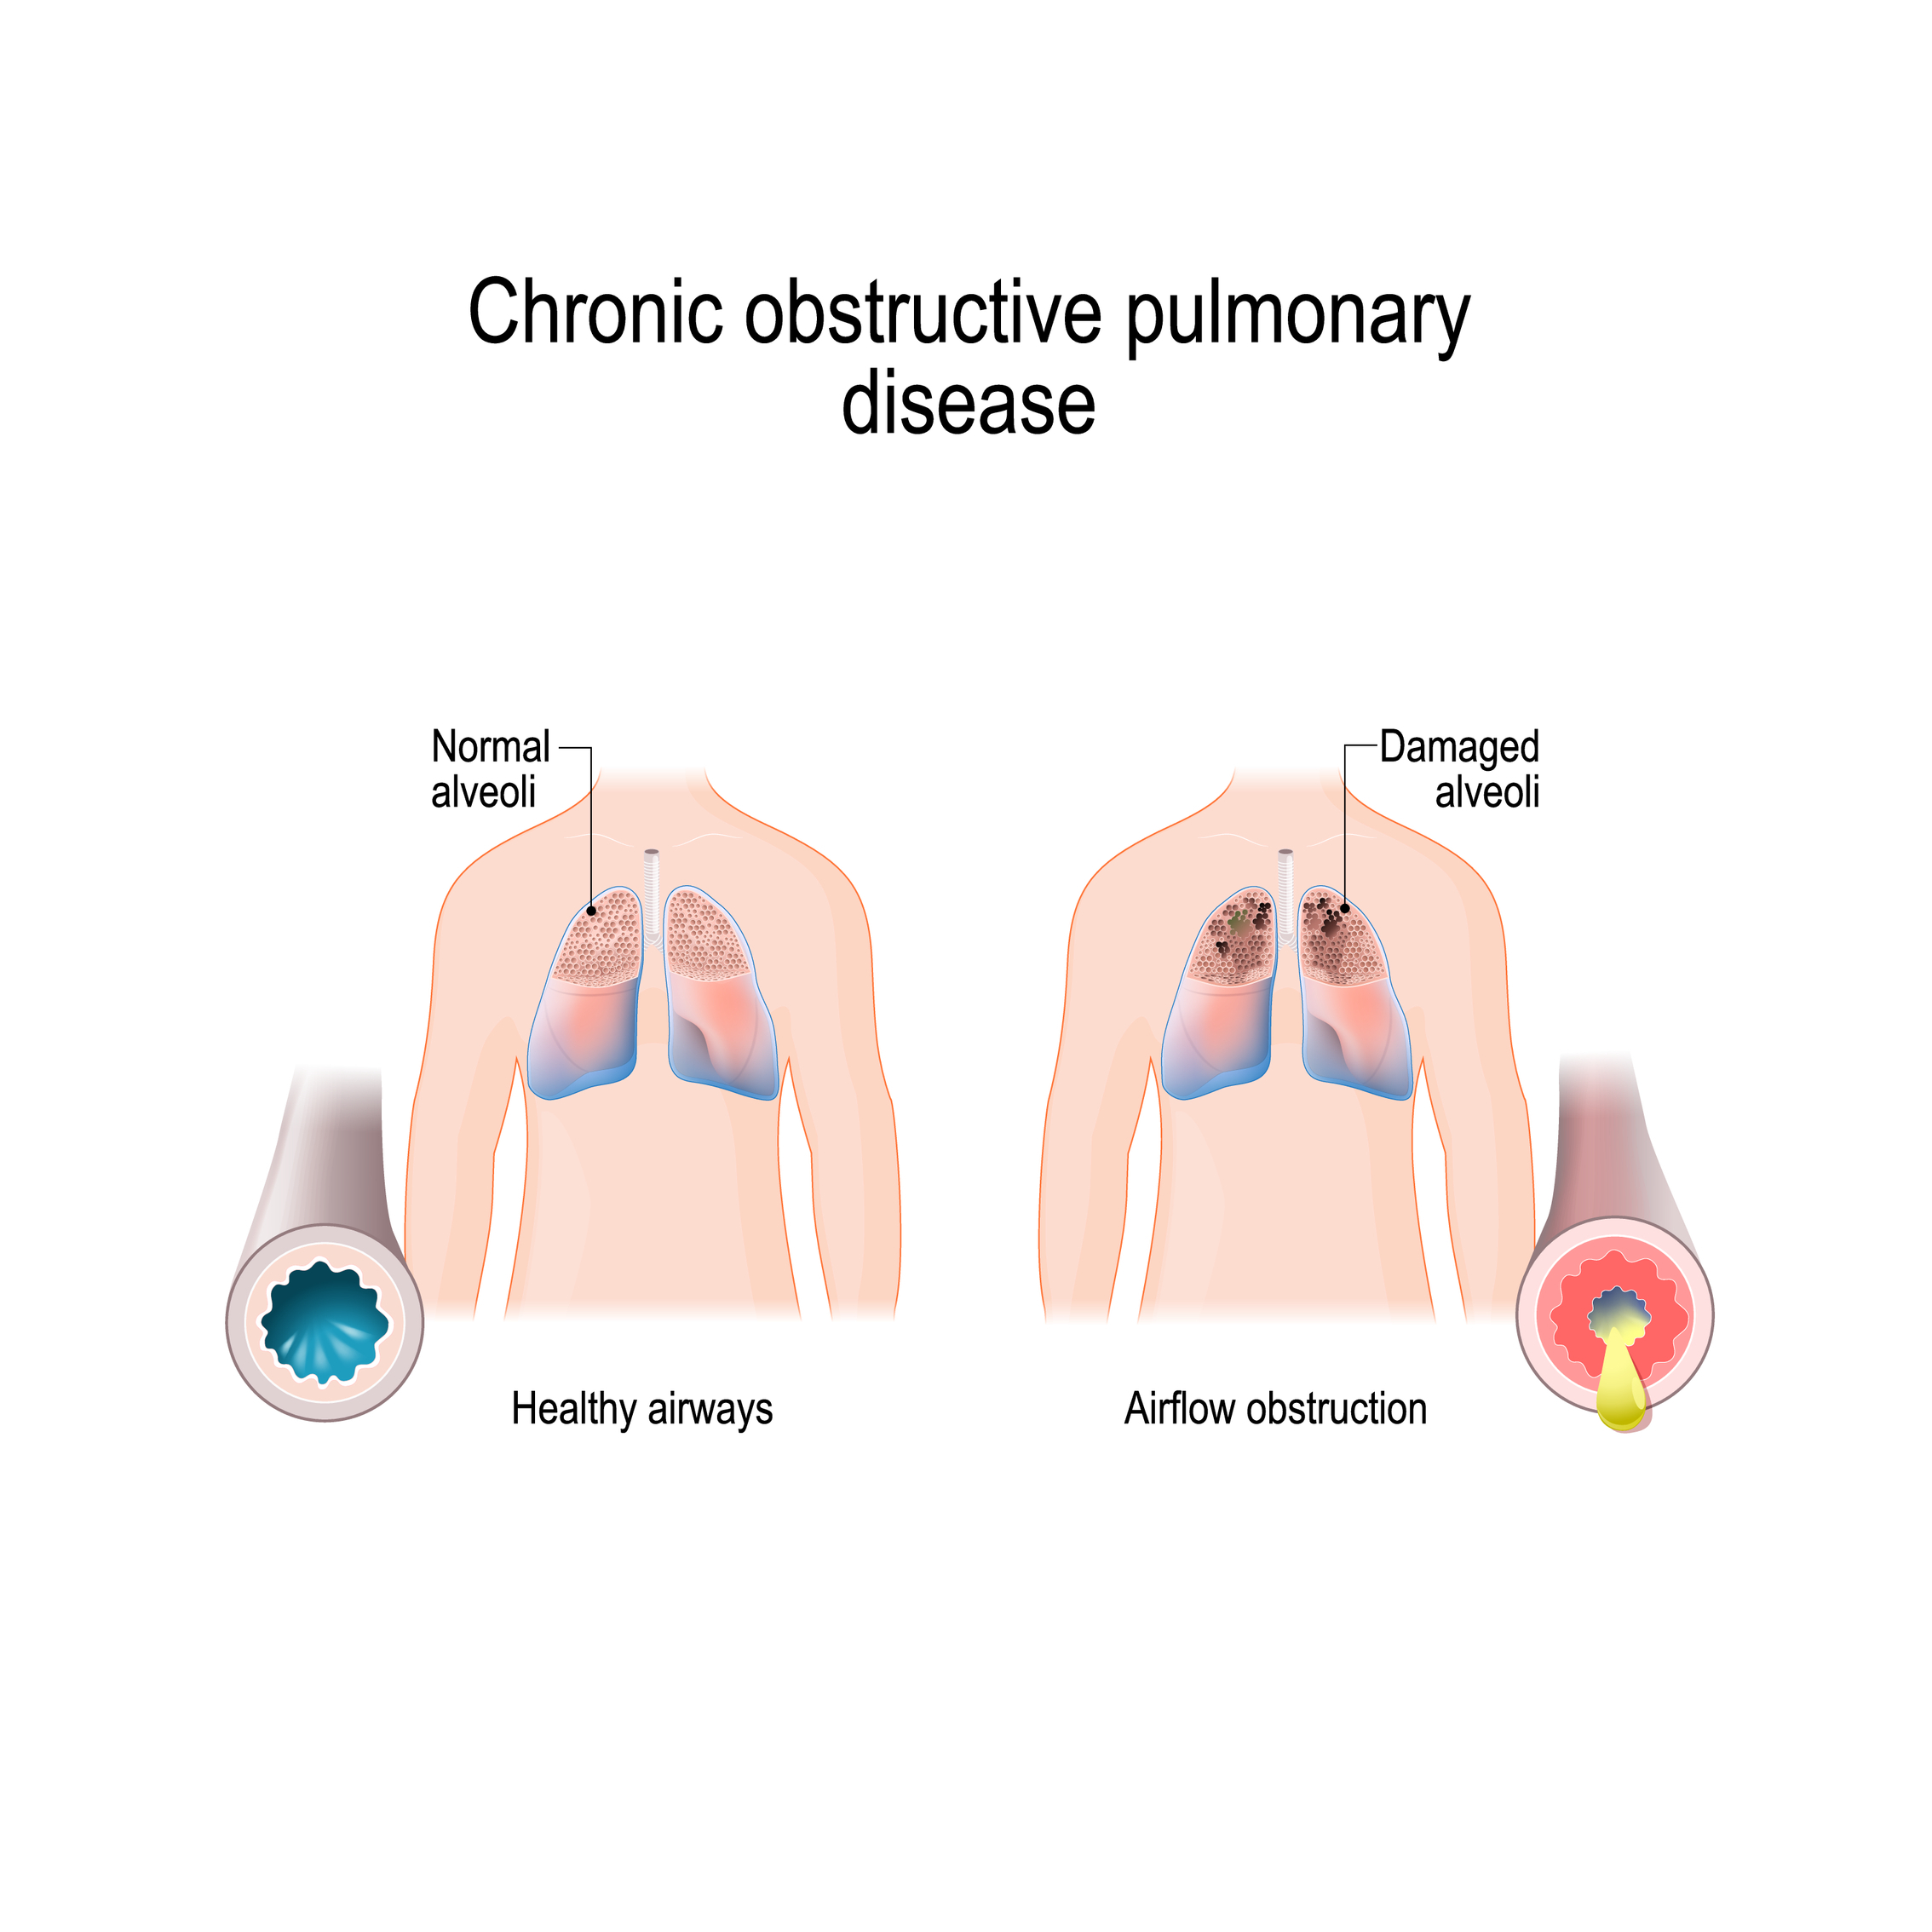 Chronic obstructive pulmonary disease: